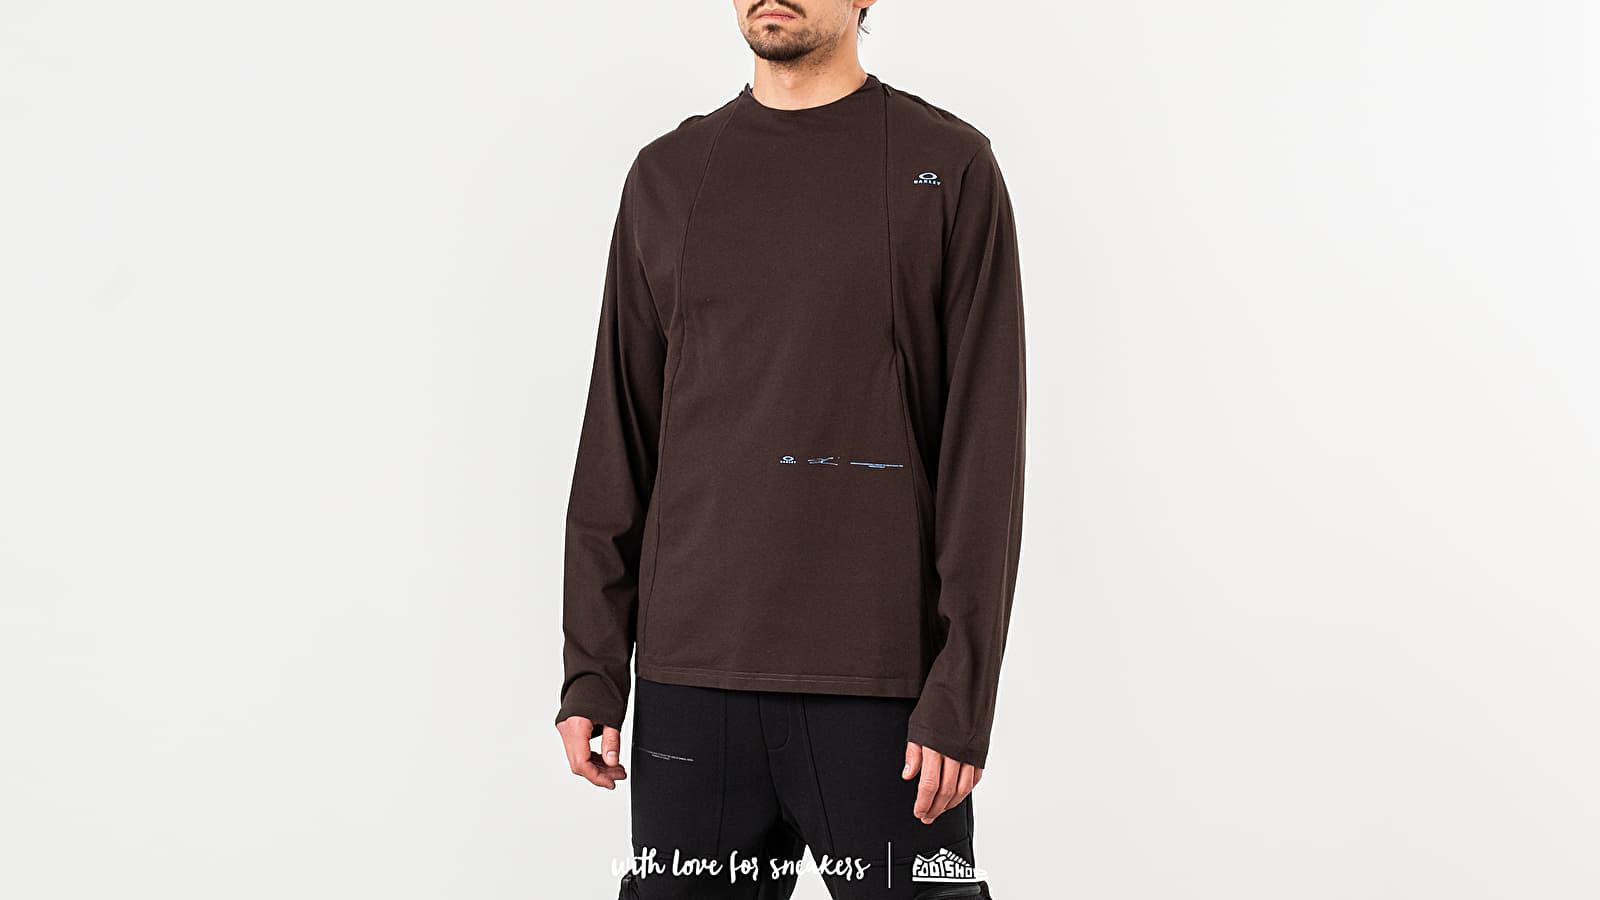 Tričká Oakley by Samuel Ross Skydiver Zipped Long Sleeve Tee Brown